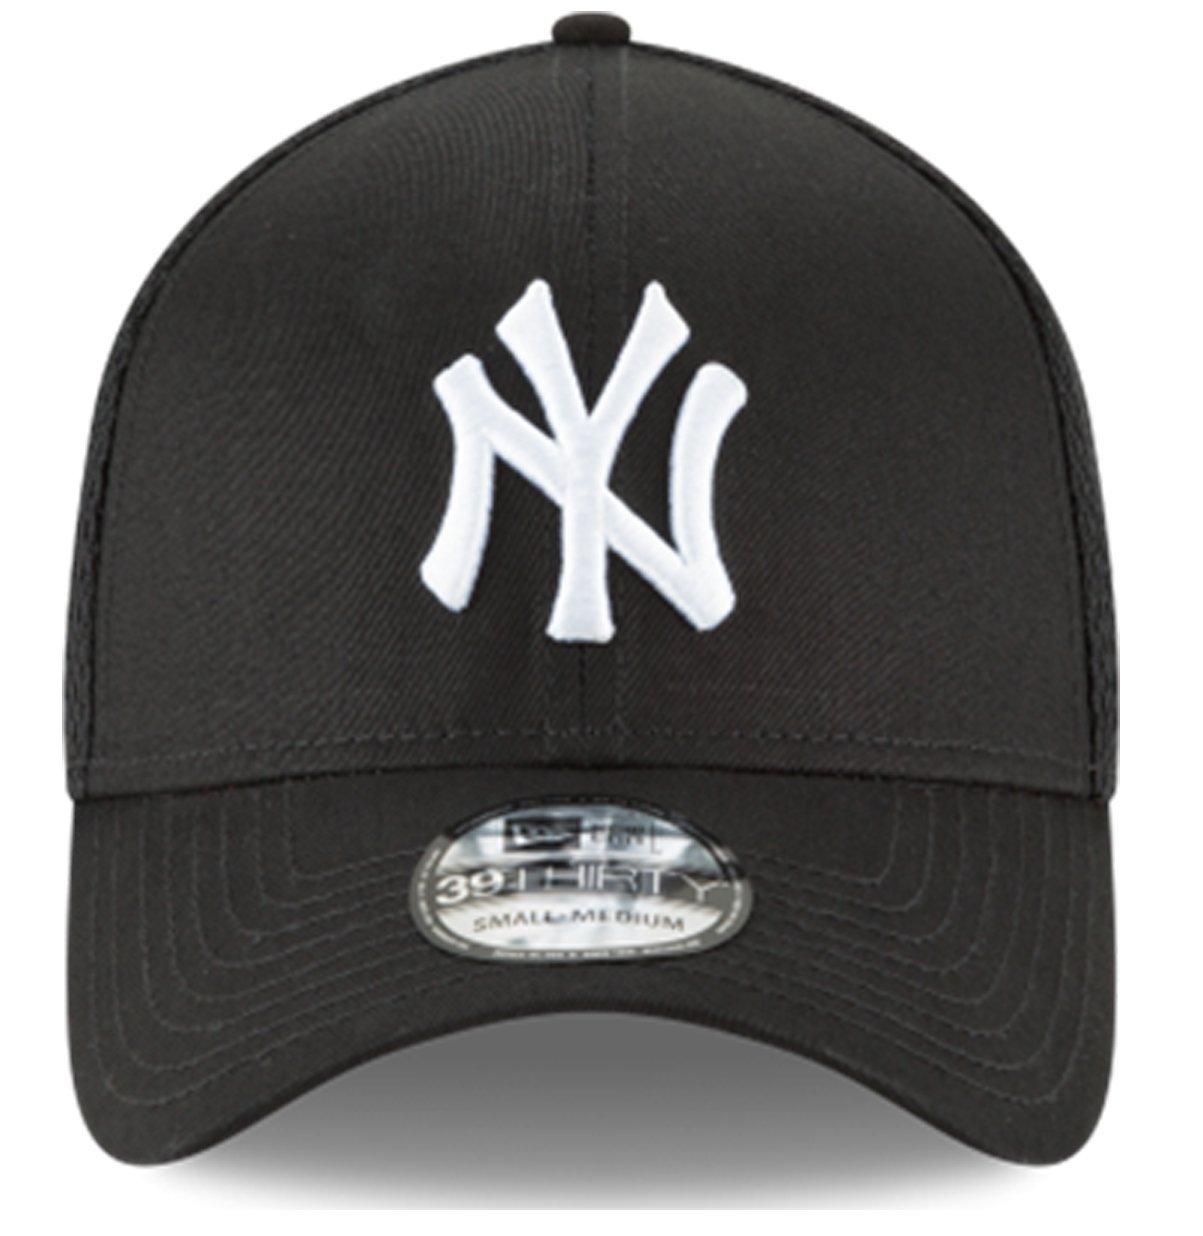 01c98cf121379 Amazon.com  New Era Authentic New York Yankees Black Neo 39THIRTY Flex Hat  (M L)  Sports   Outdoors